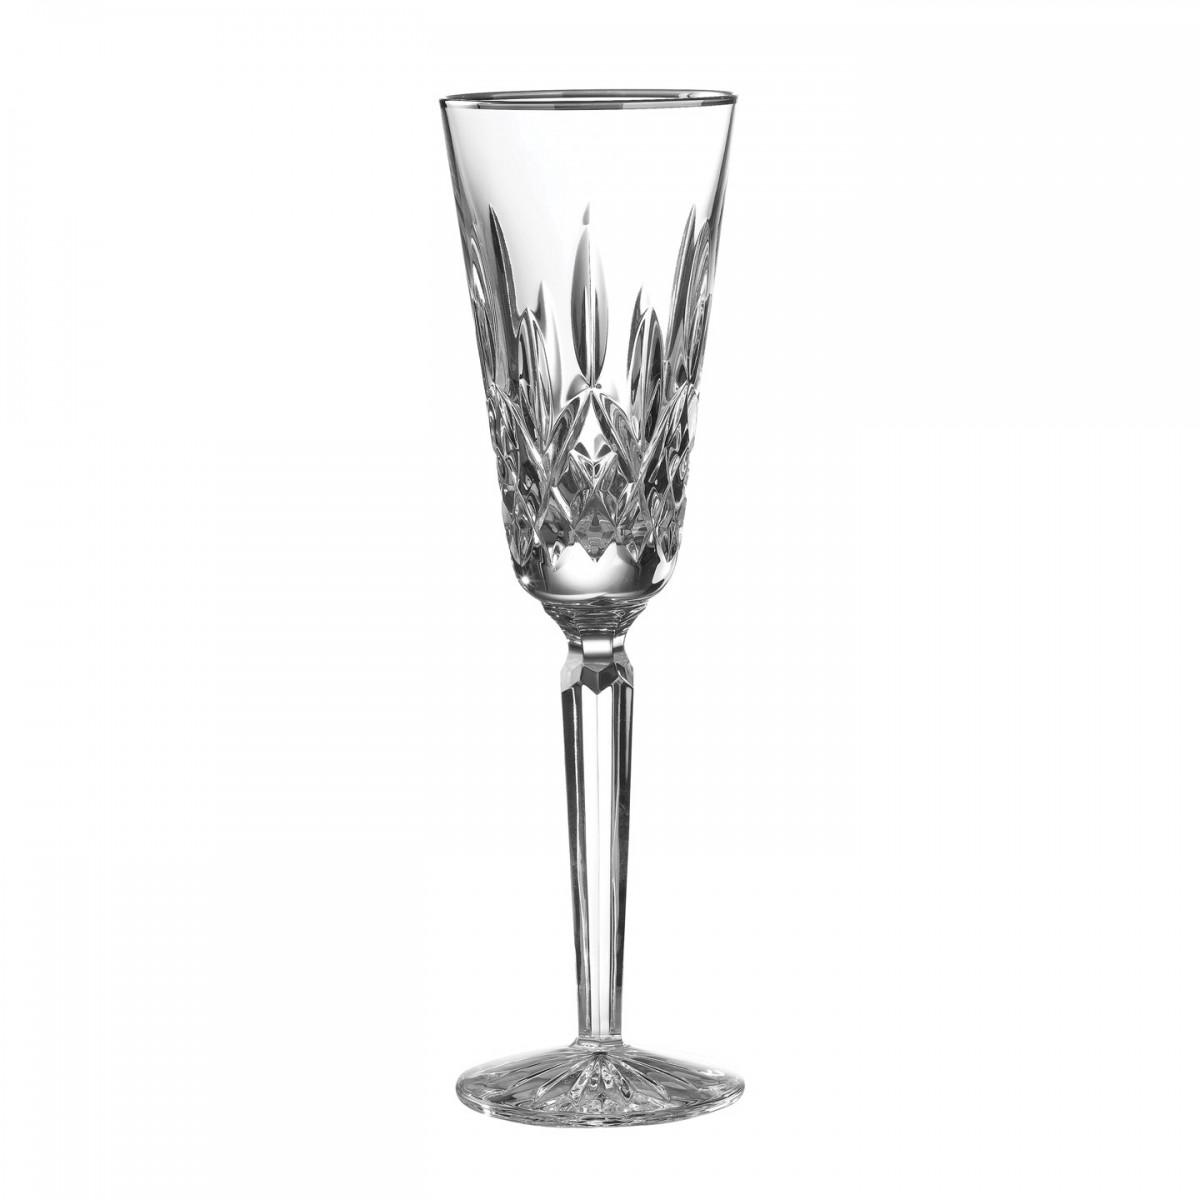 waterford-lismore-tall-platinum-champagne-flute-024258262645.jpg